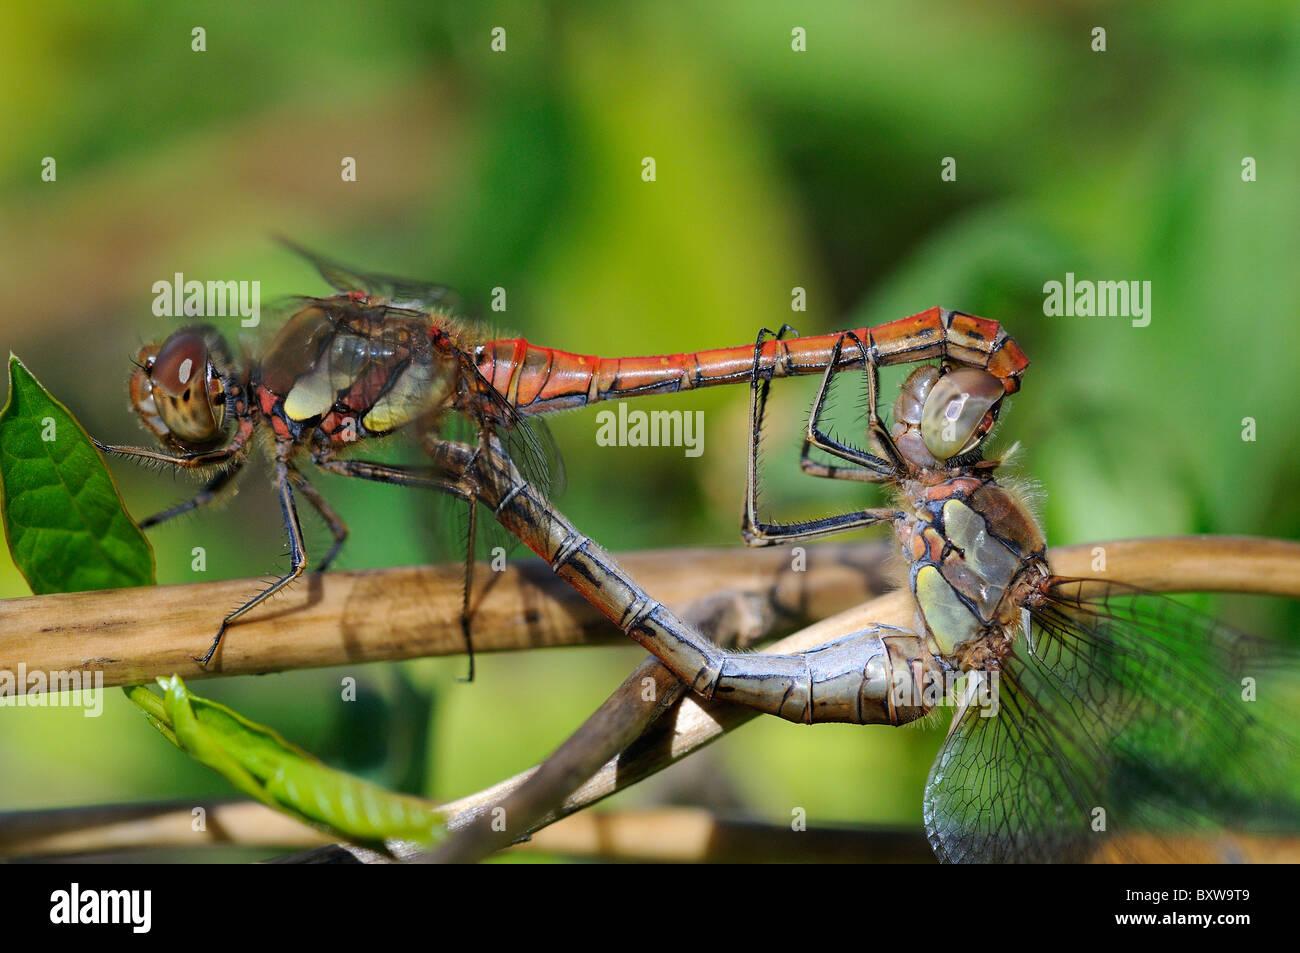 Common Darter Dragonfly (Sympetrum striolatum) pair mating, Oxfordshire, UK. - Stock Image